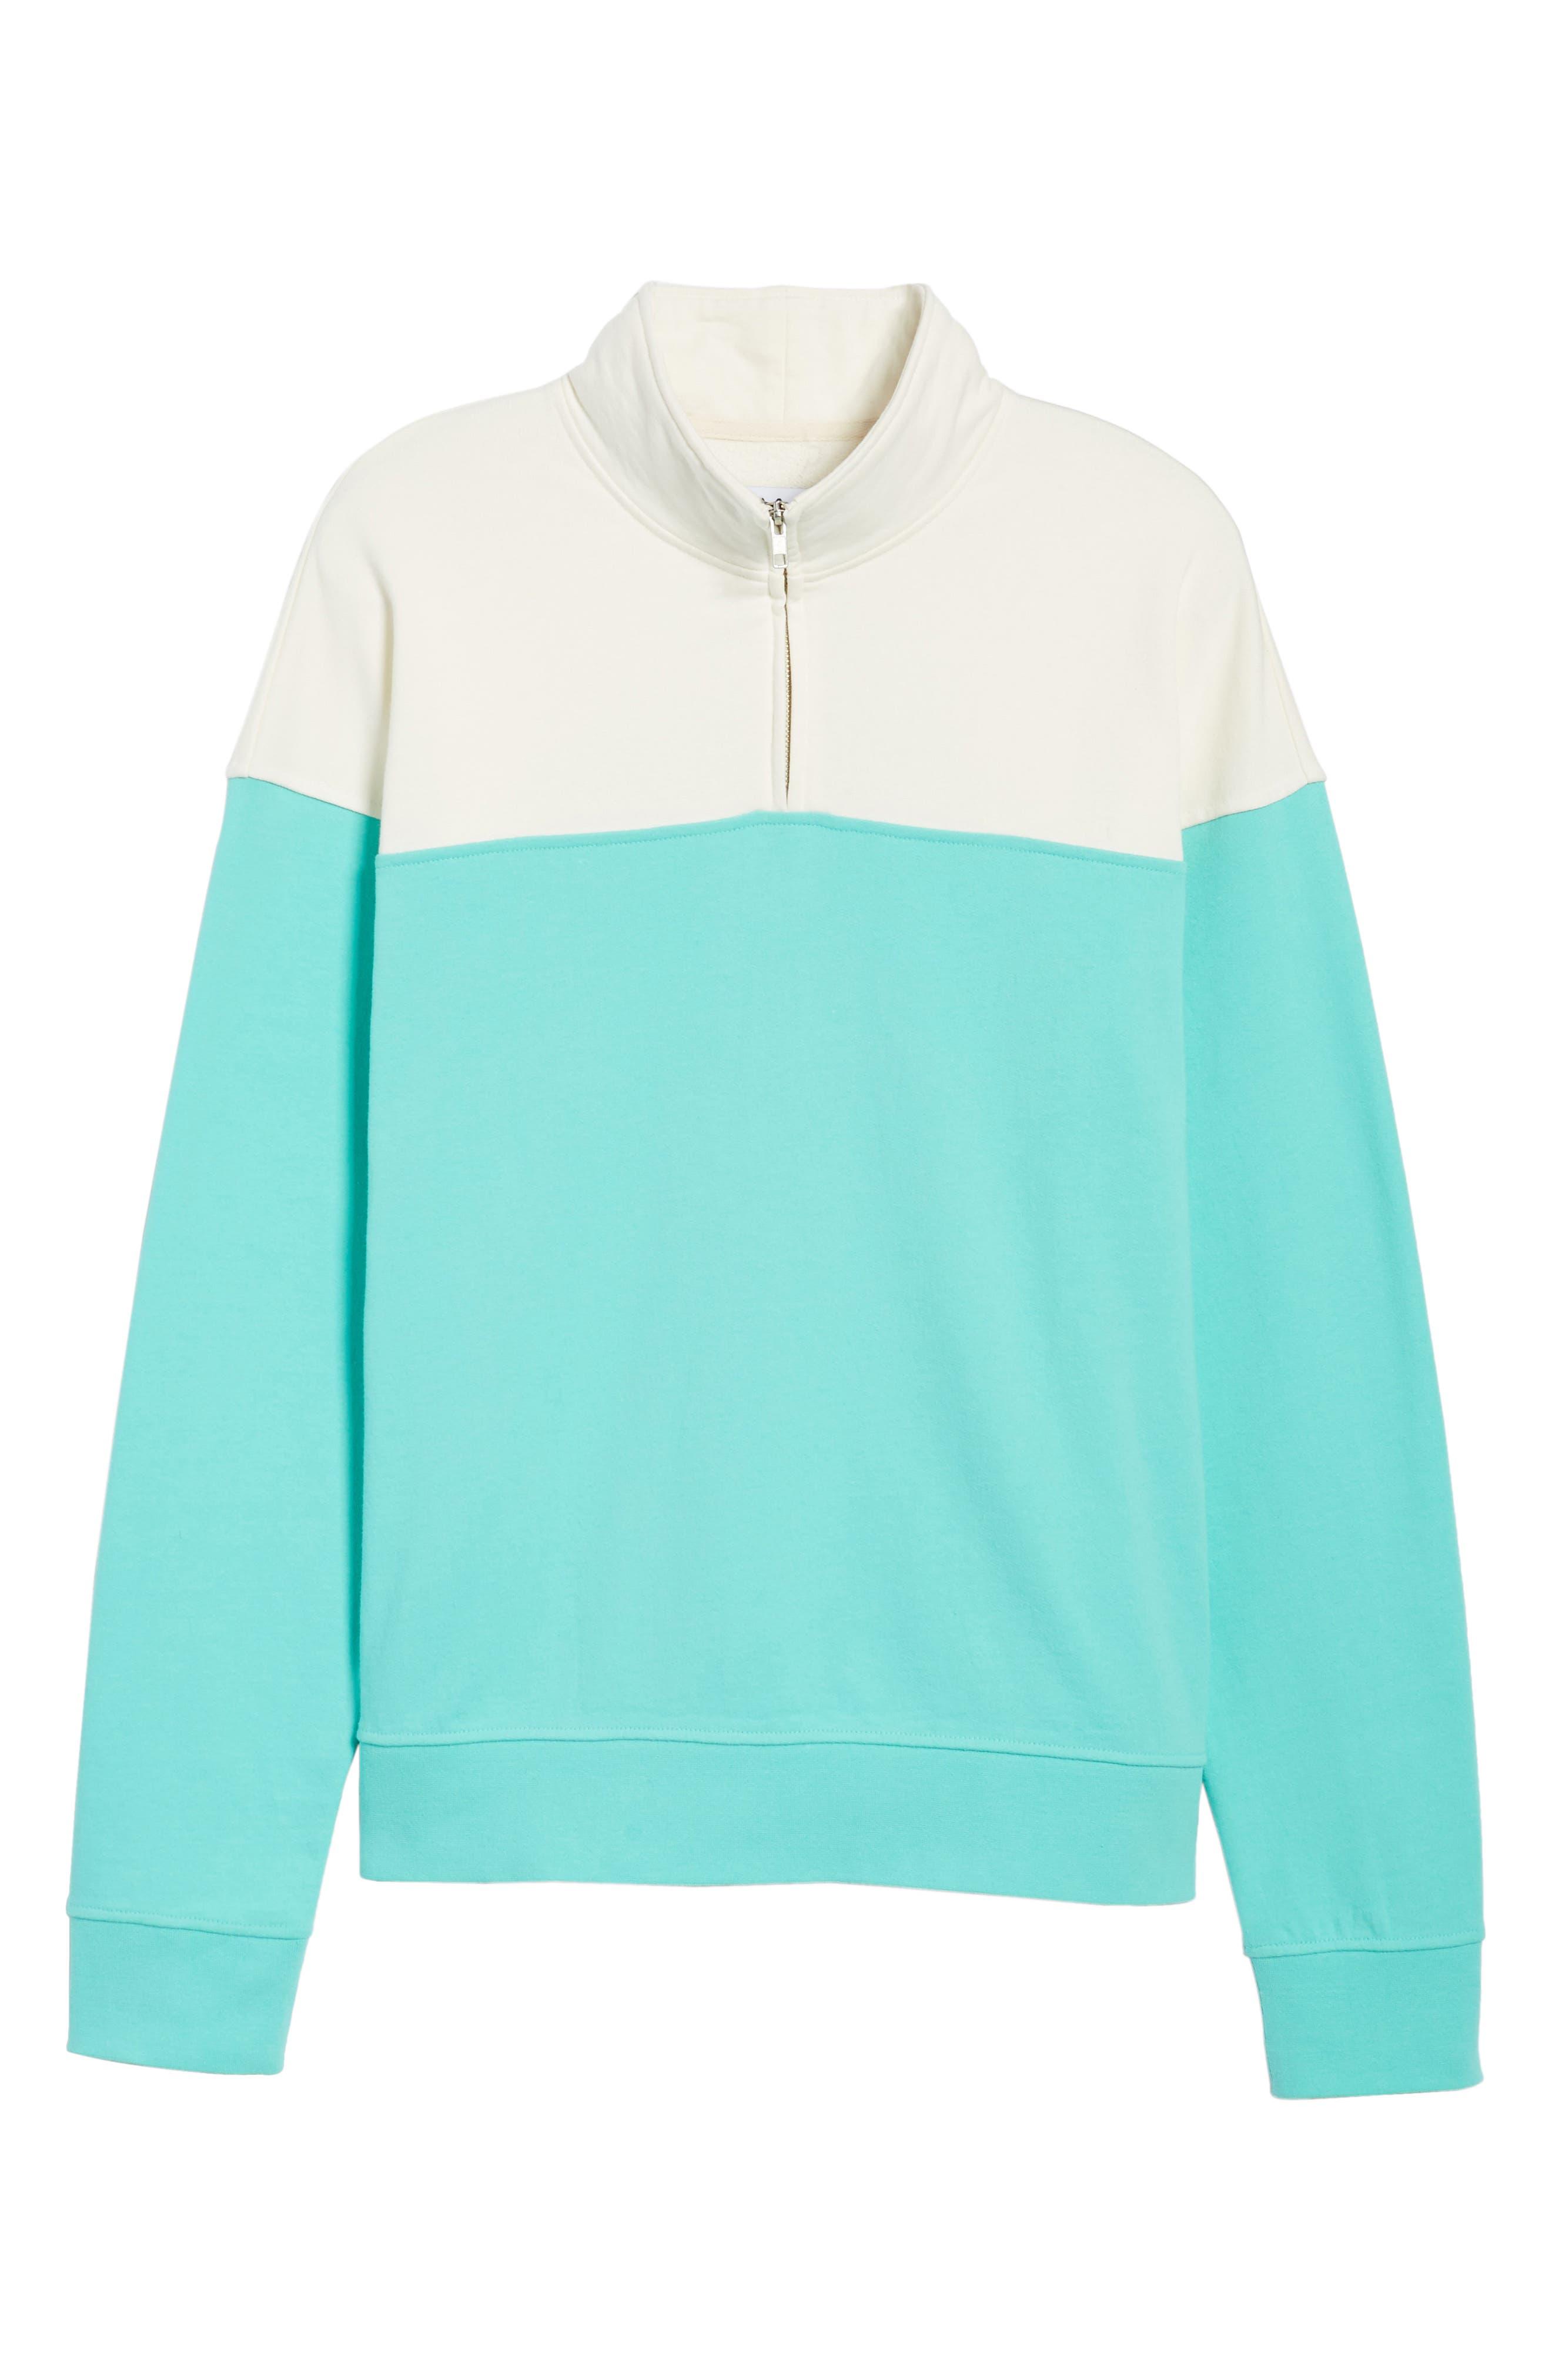 Colorblock Quarter Zip Sweatshirt,                             Alternate thumbnail 6, color,                             900